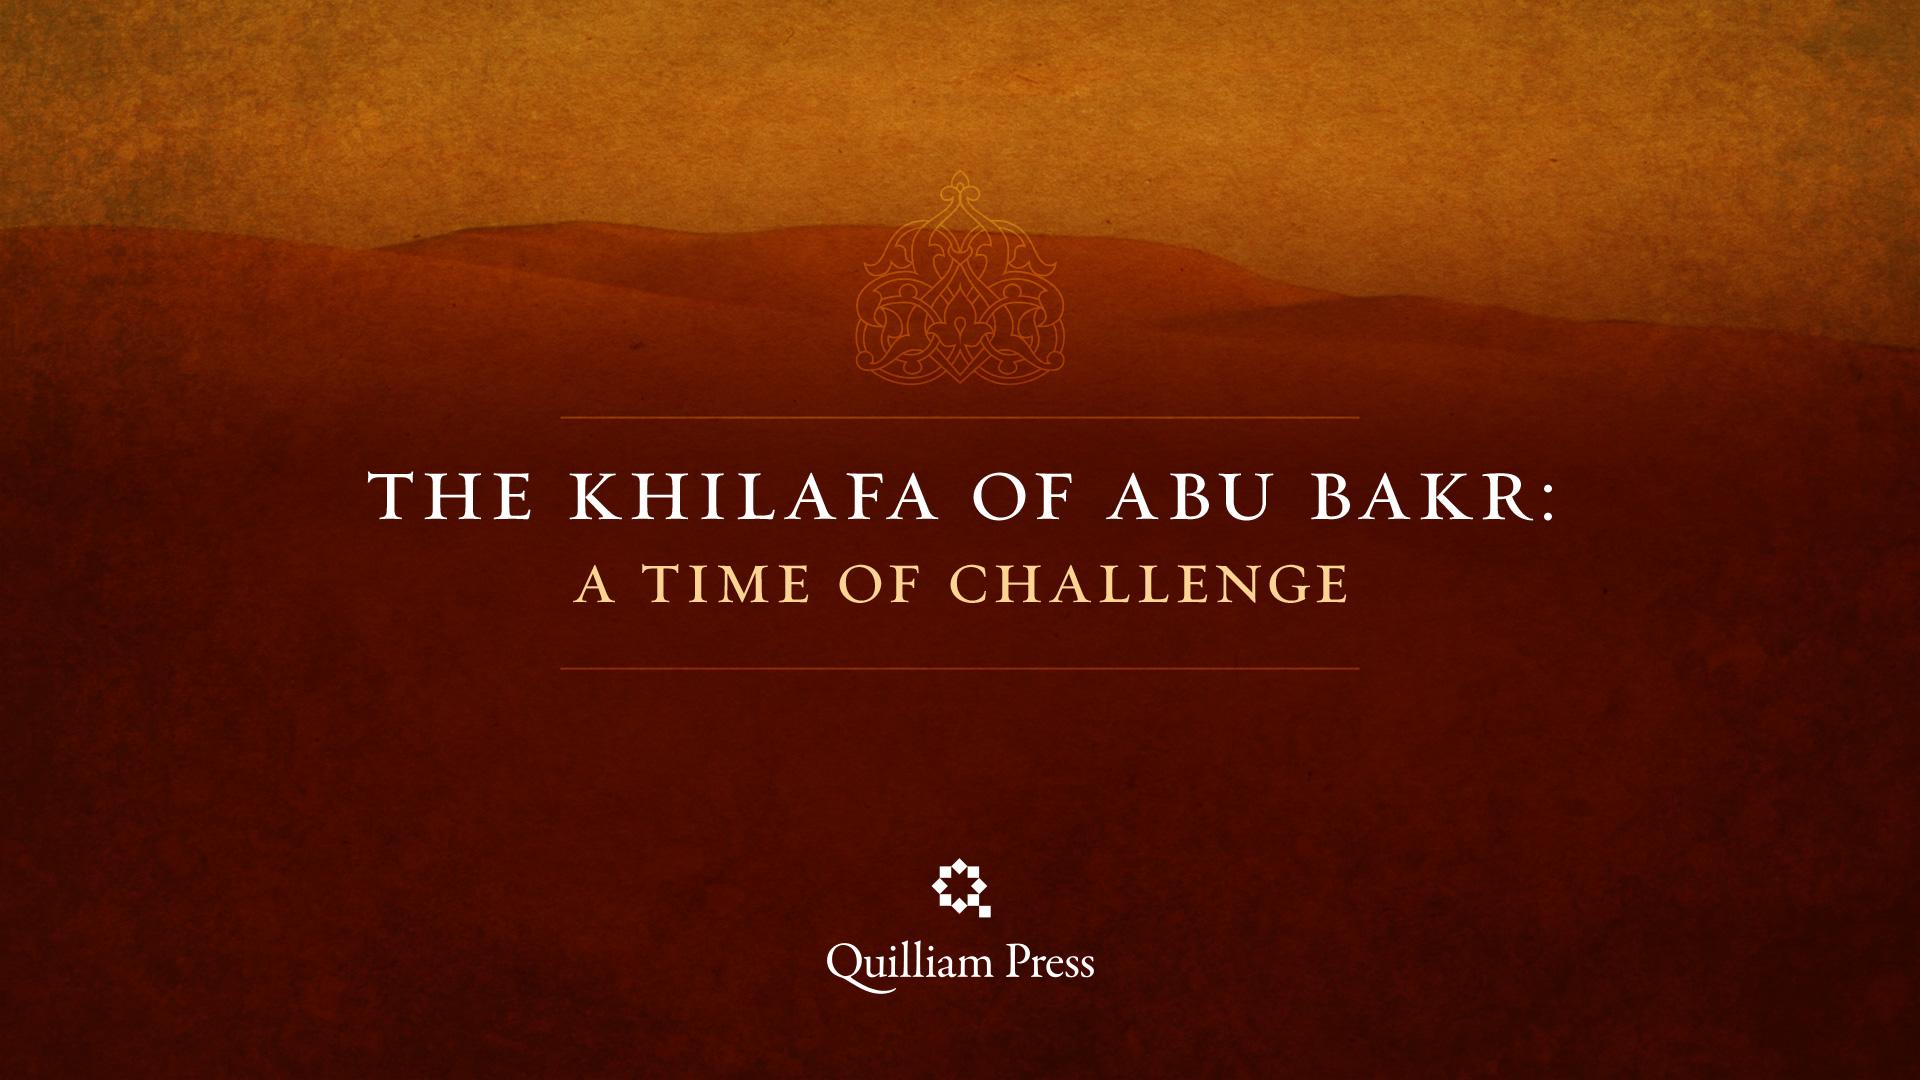 Quilliam_Press_Khilafa_Series_01.jpg